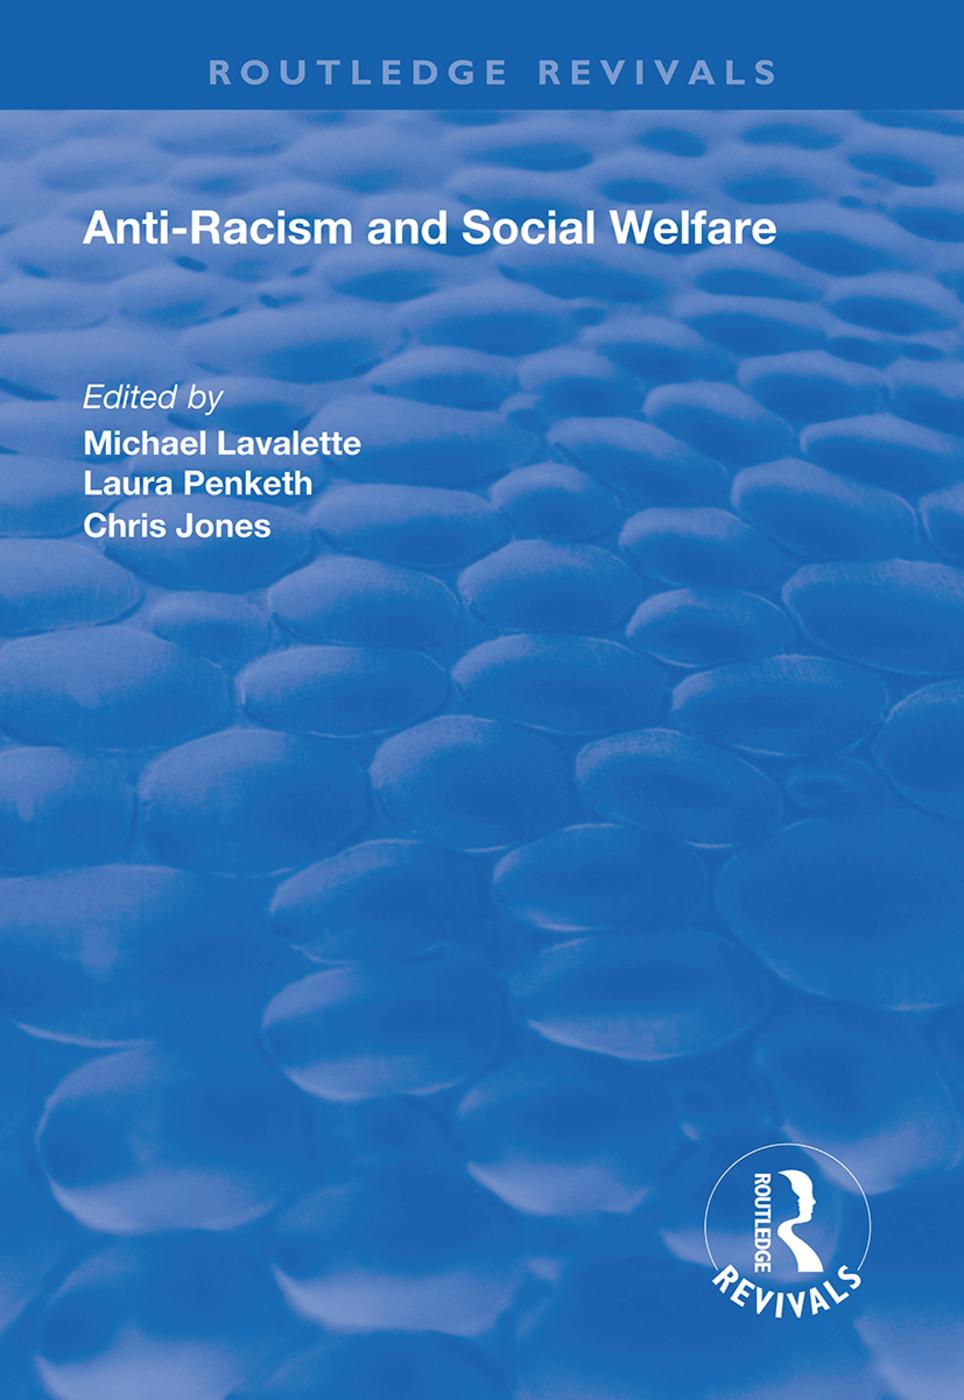 Anti-Racism and Social Welfare